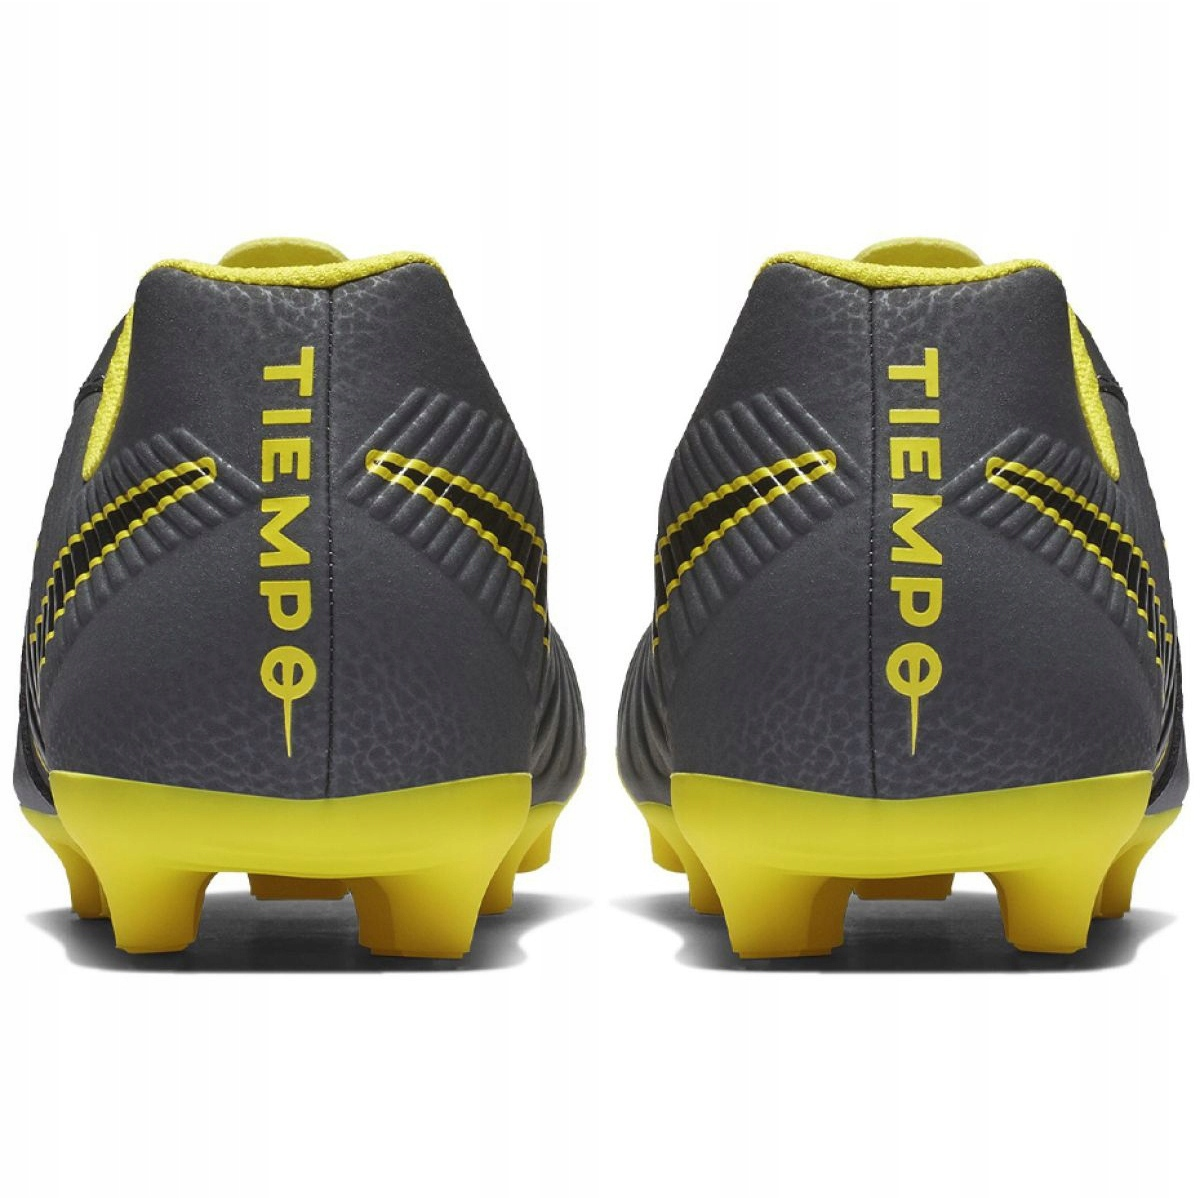 new arrivals c7f83 8e7a1 Football shoes Nike Tiempo Legend 7 Club Mg Jr AO2300-070